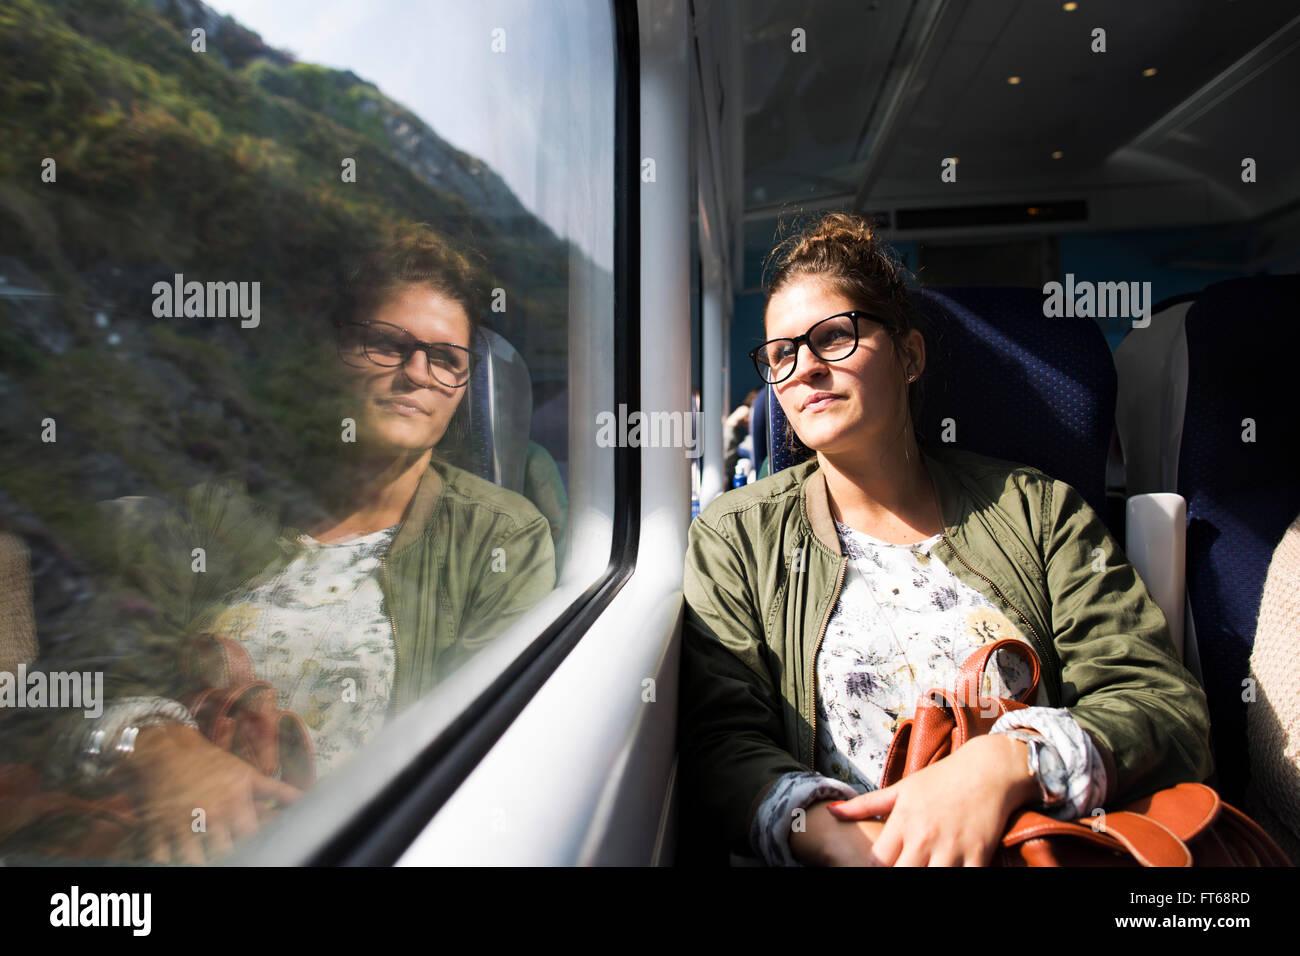 Thoughtful businesswoman looking through train window - Stock Image